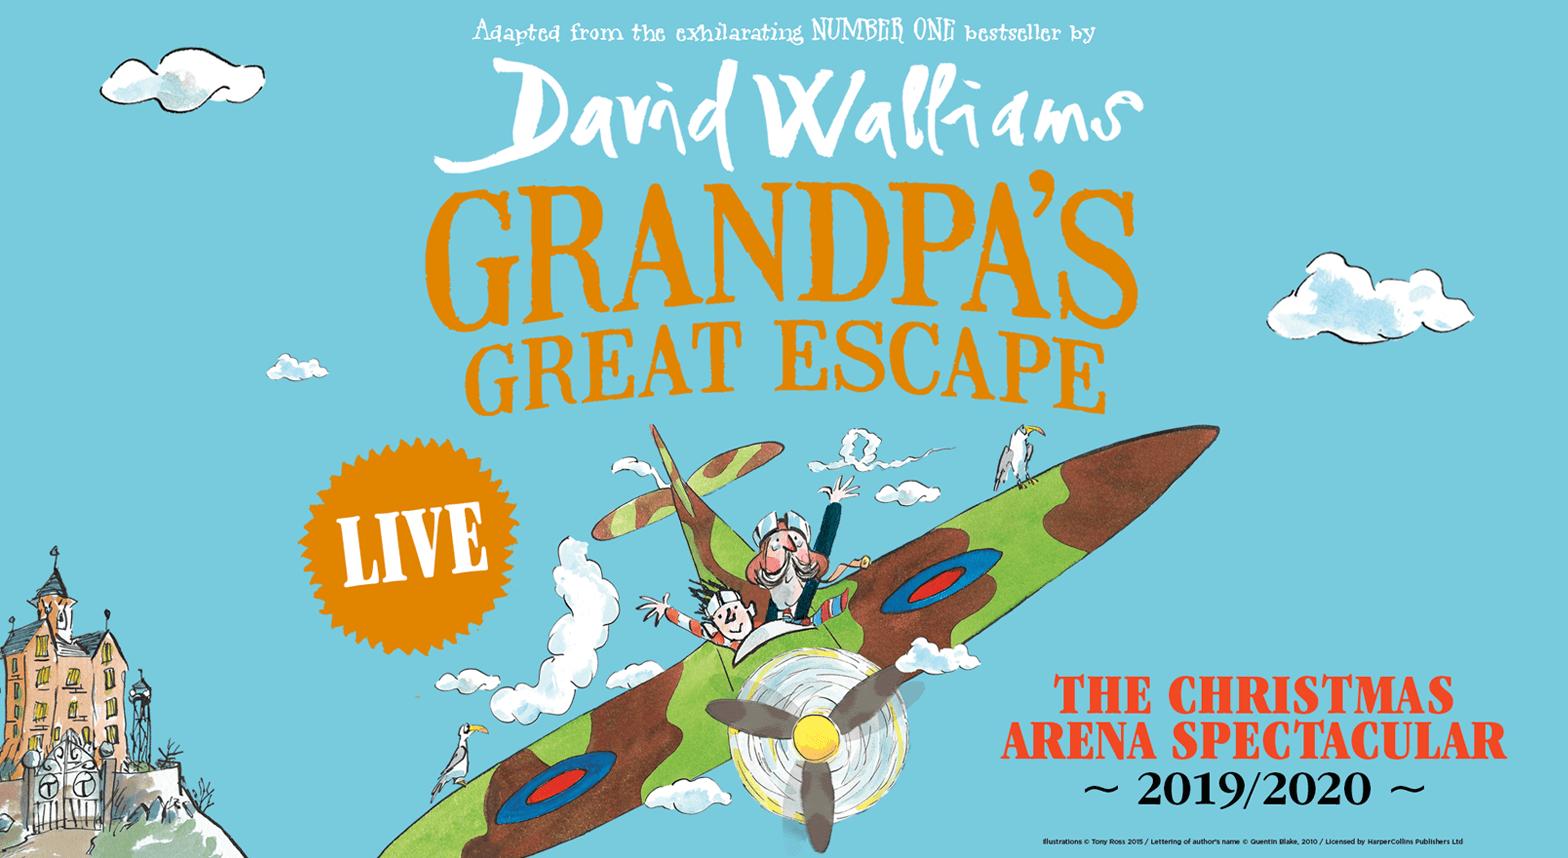 grandpas-great-escape-arenasV1.png